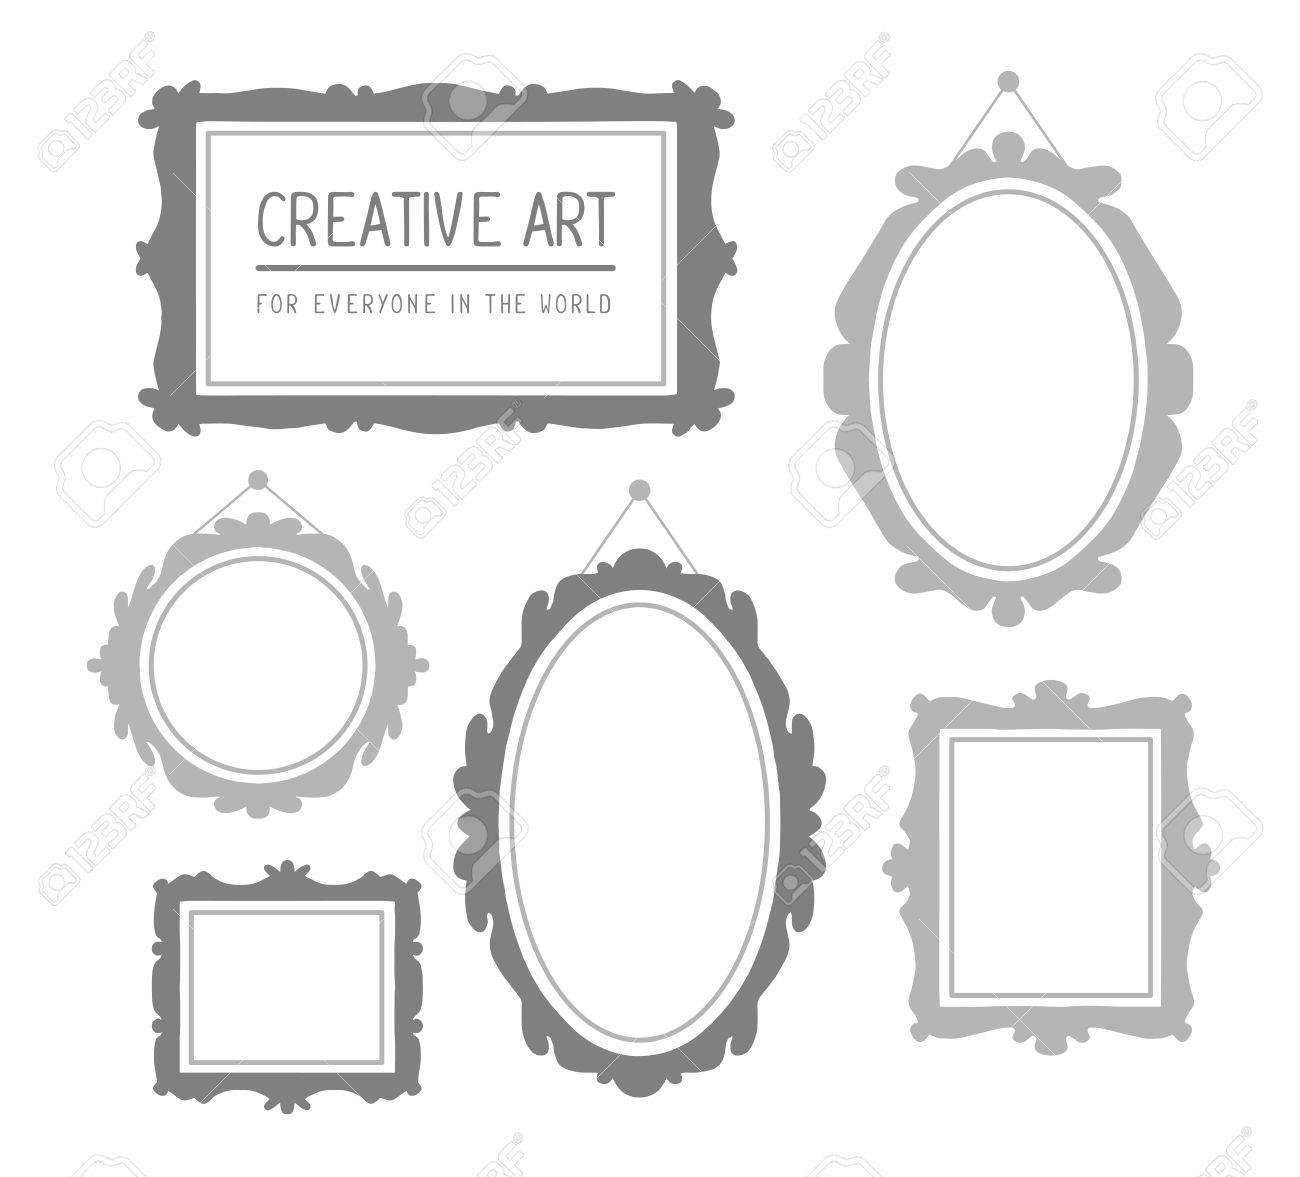 Dorable 5x7 Negro Marco De Imagen Ovalada Ornamento - Ideas ...